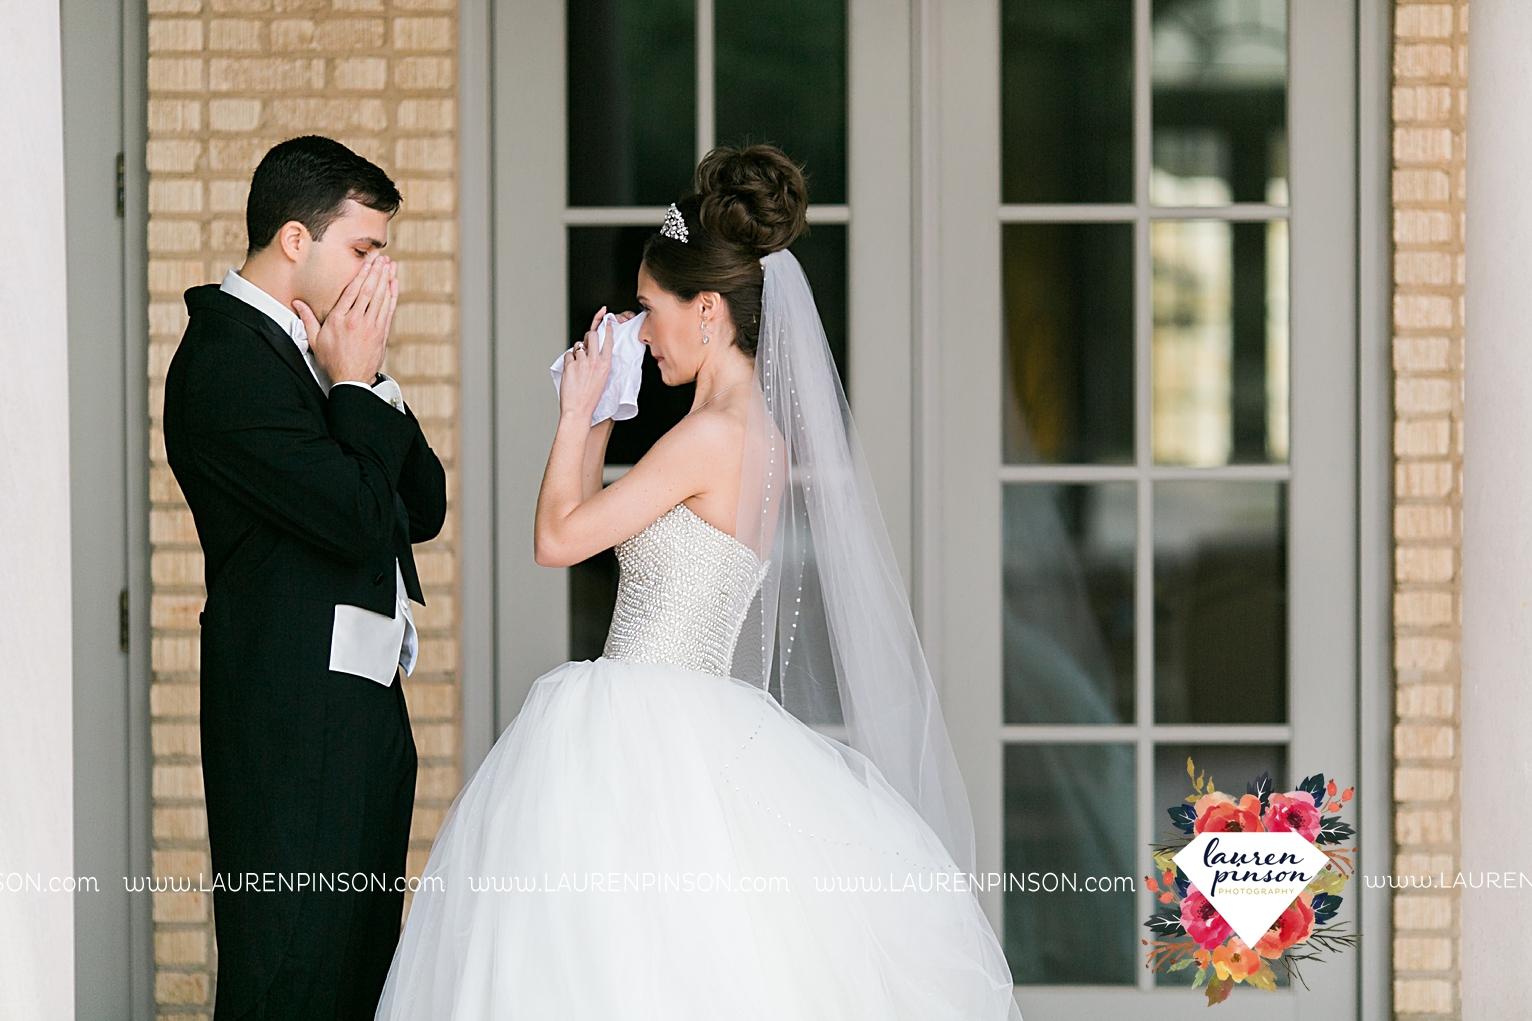 wichita-falls-texas-wedding-photographer-the-forum-by-the-kemp-mayfield-events-ulta-gold-glitter_2826.jpg